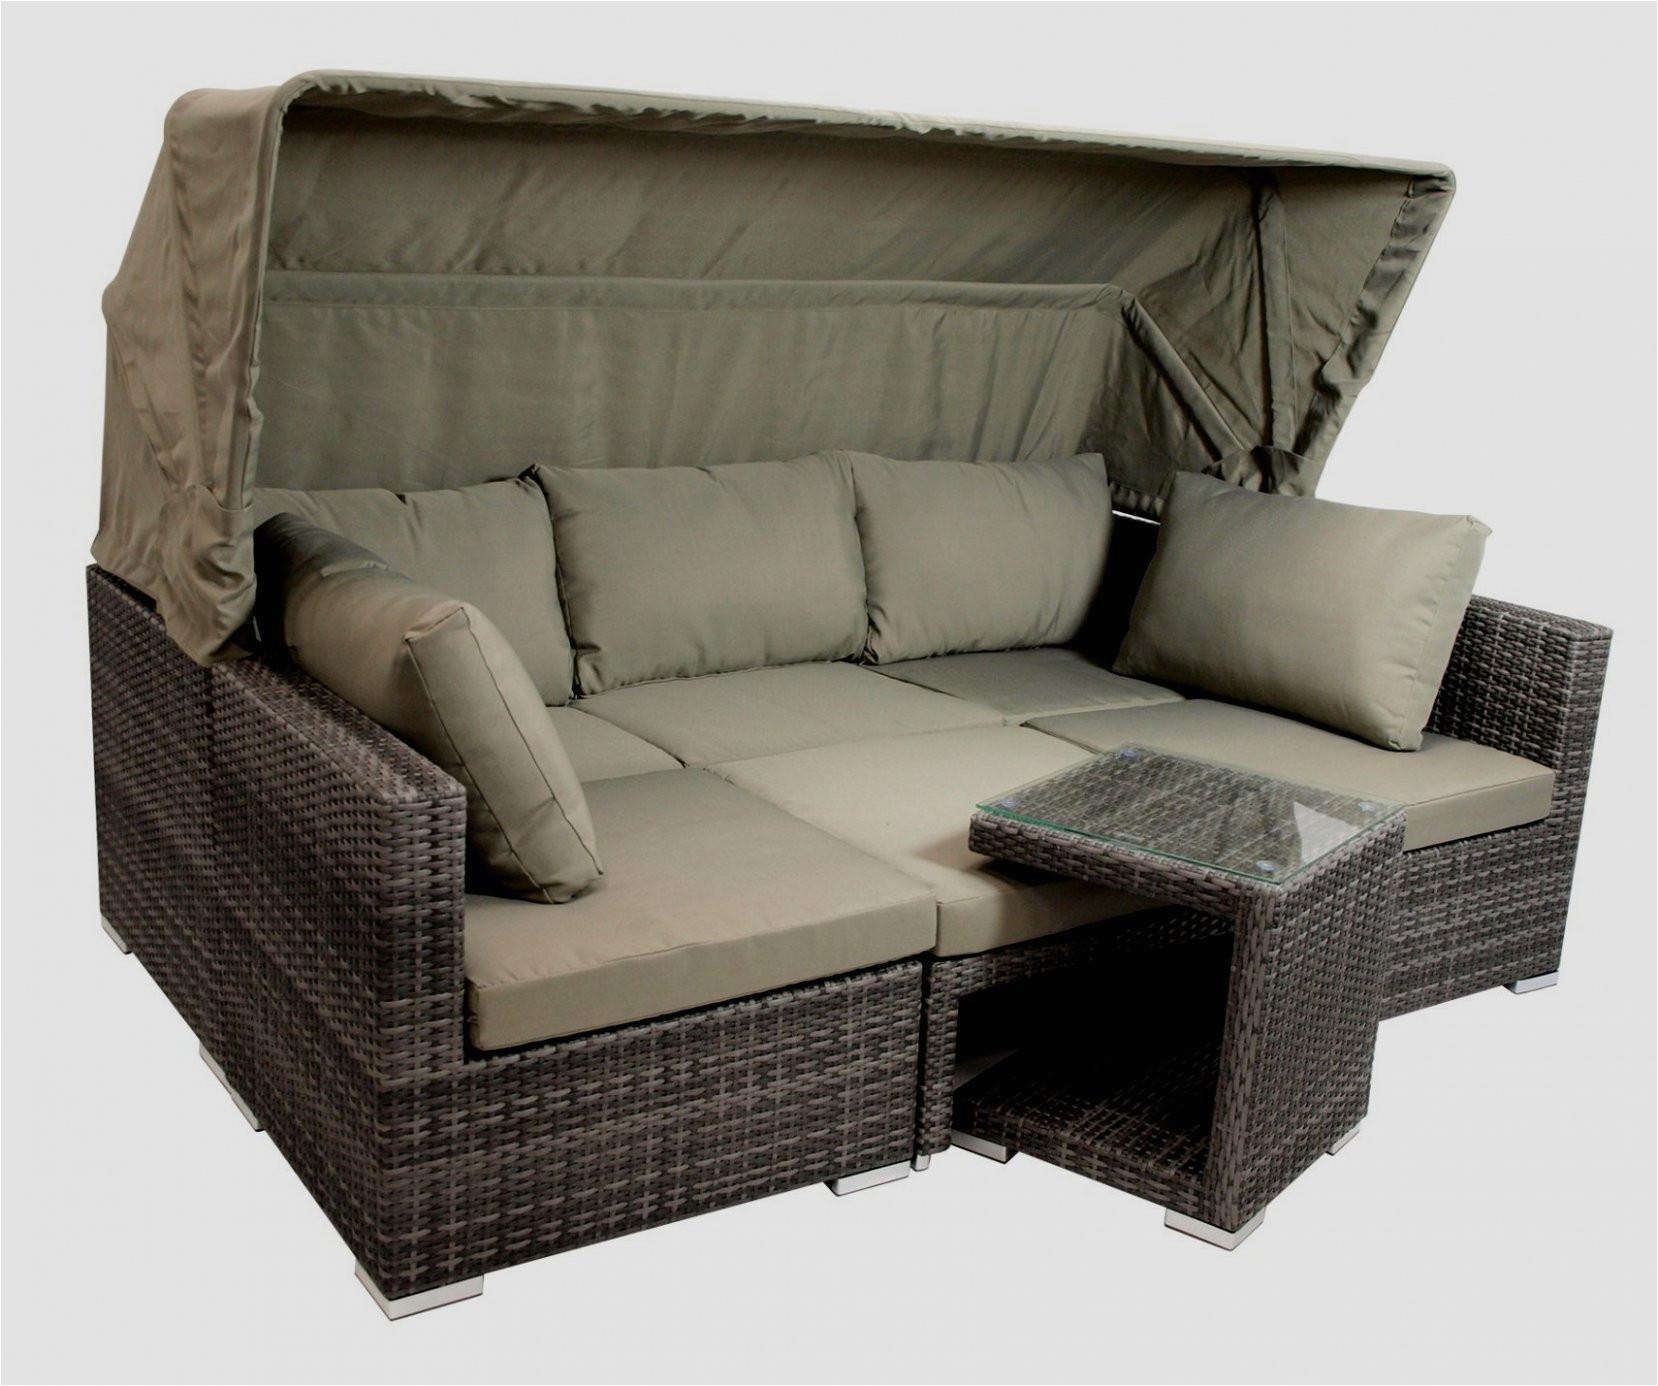 rattan sofa set new rattan ecksofa auch einzigartig neueste wicker outdoor sofa 0d patio